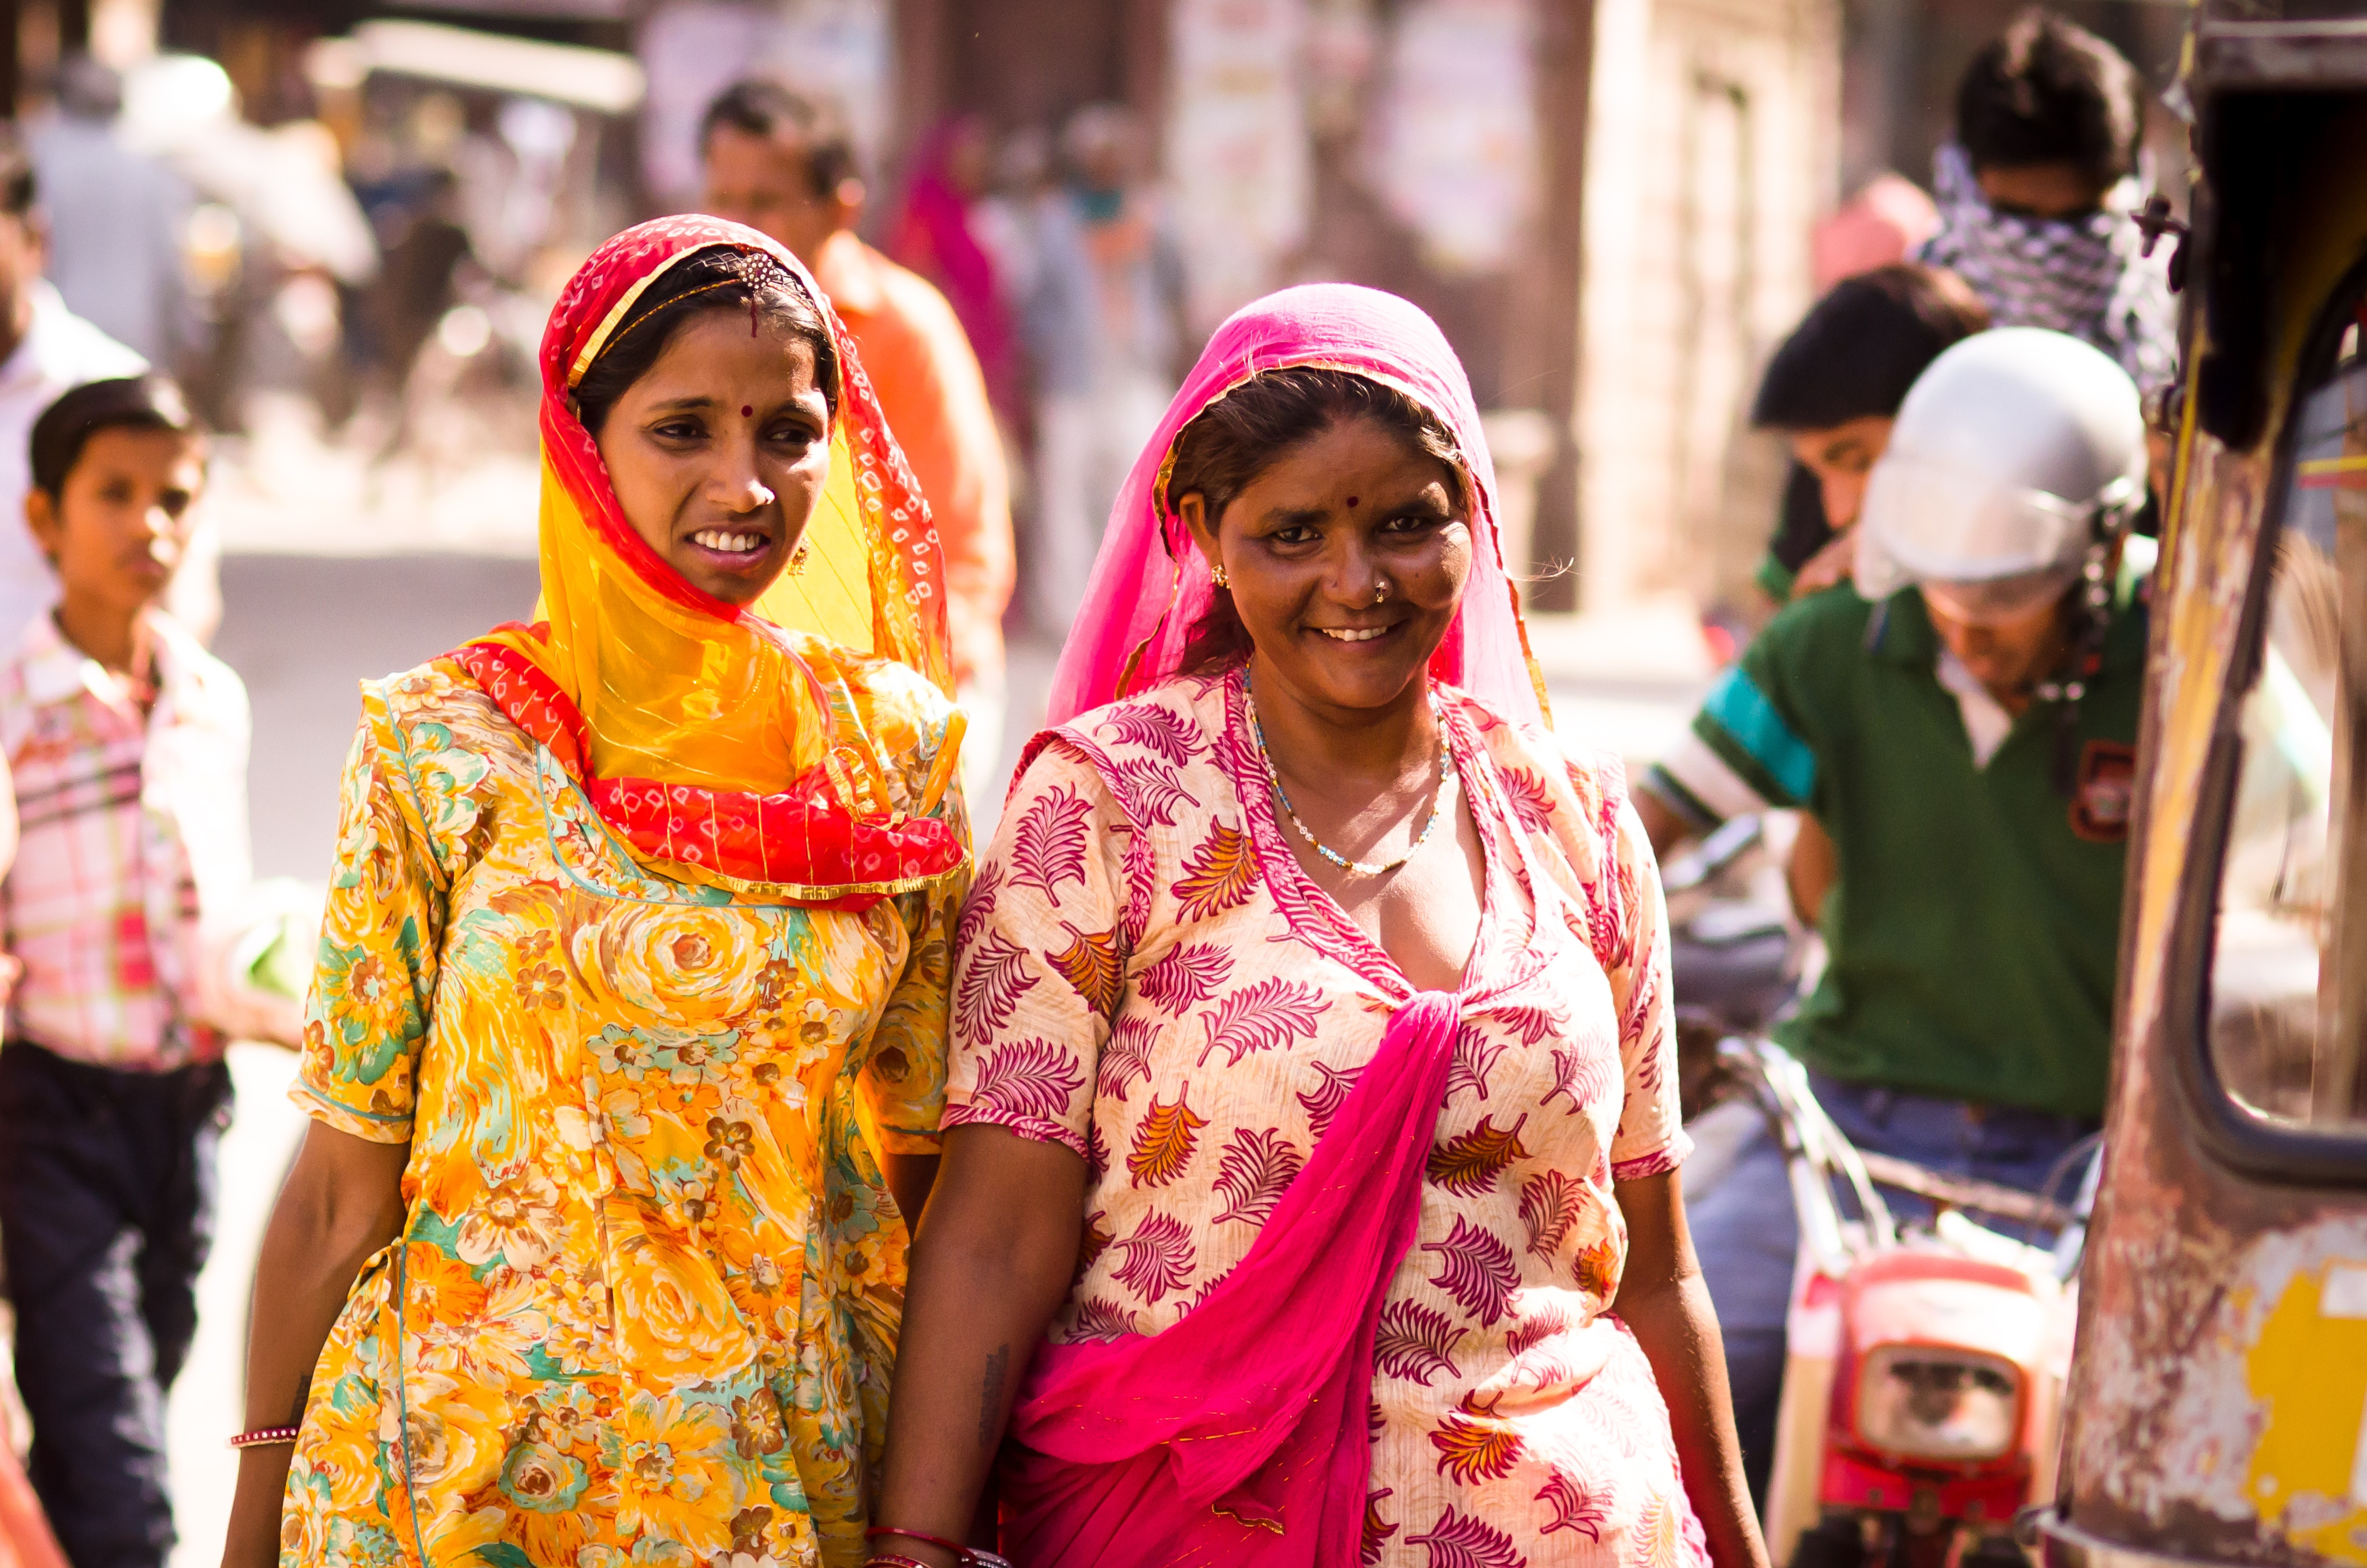 Image of women walking in India